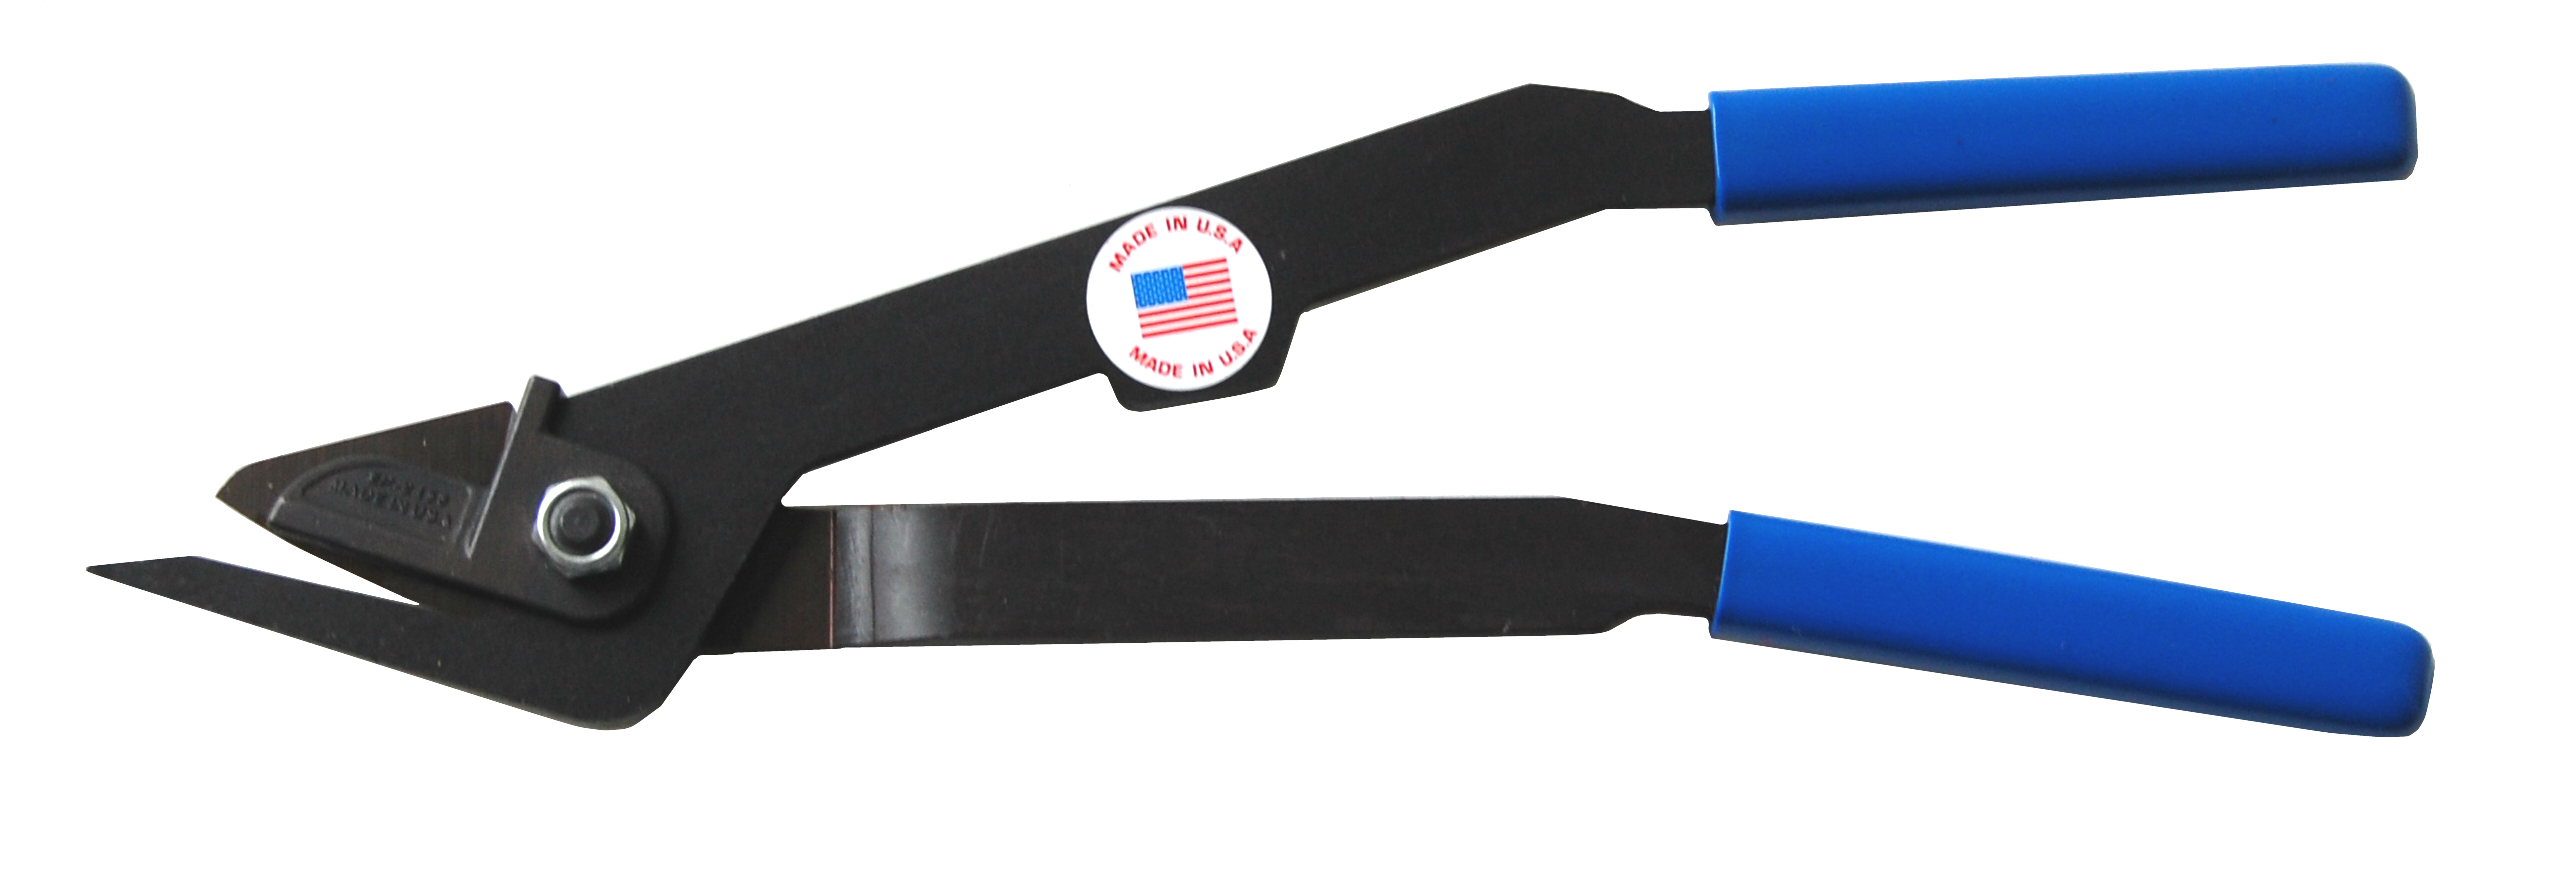 steel strap cutter